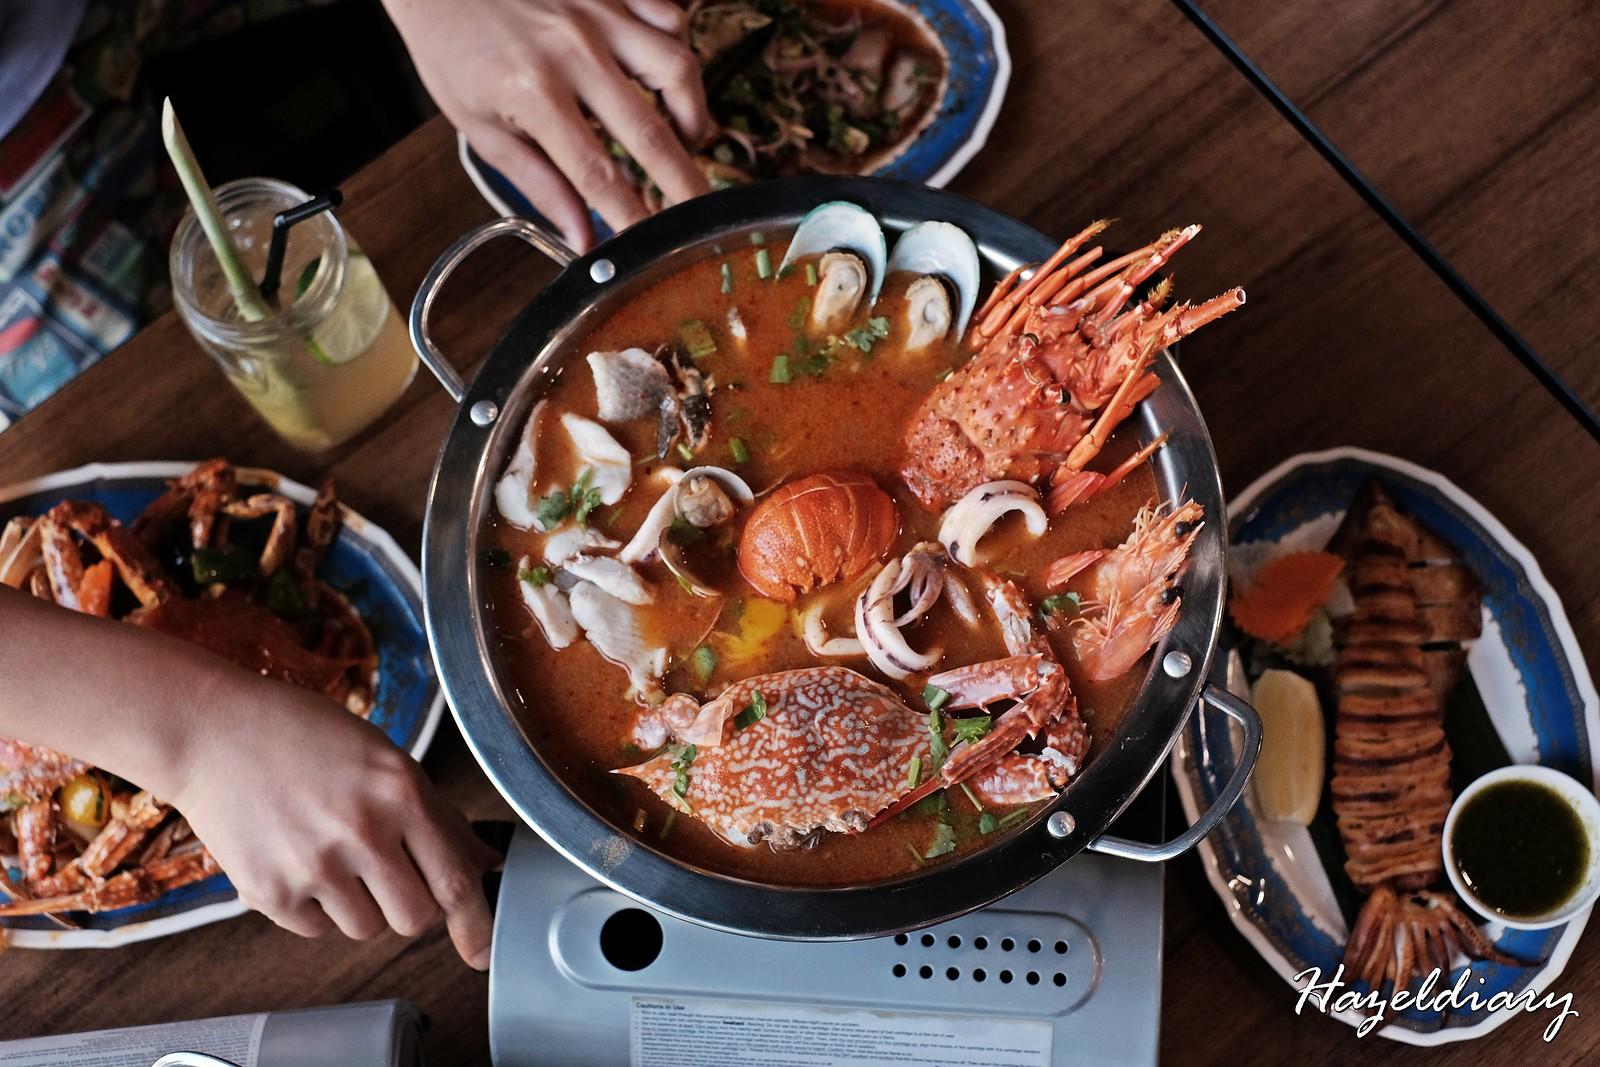 Soi Thai Soi Nice-Hotpot